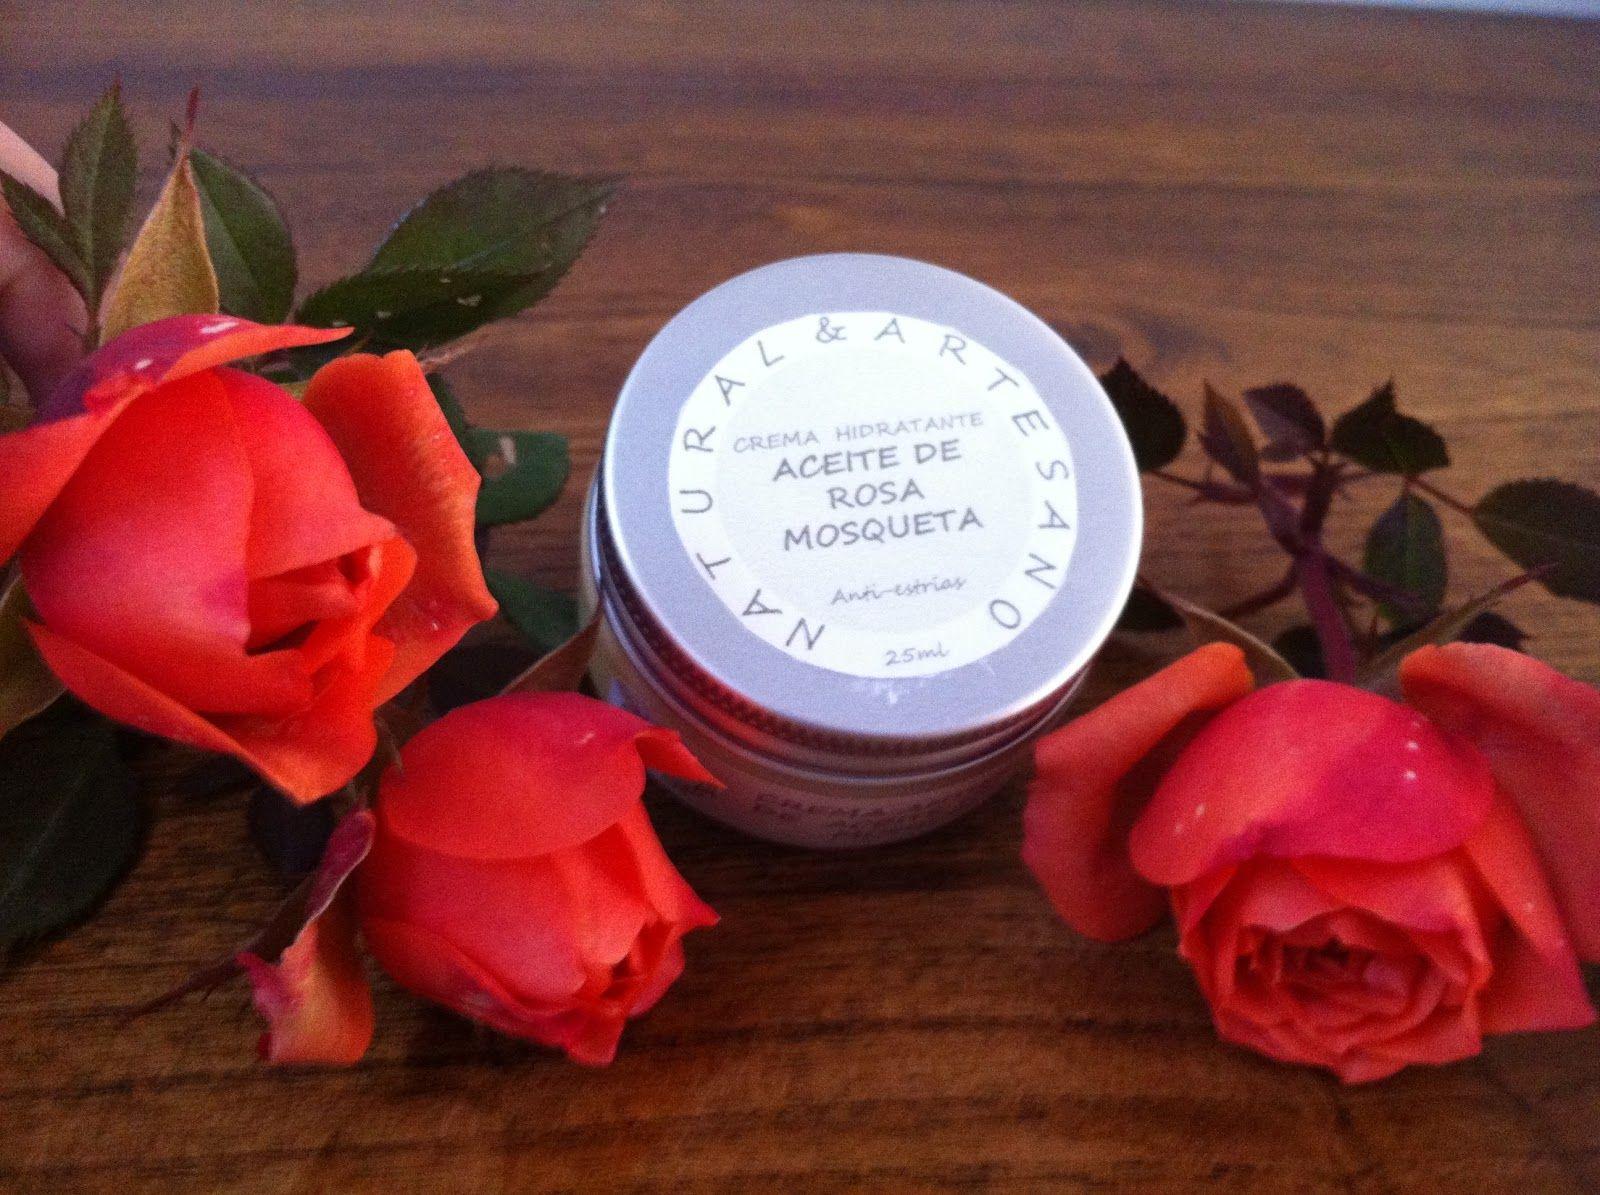 Crema de Aceite Rosa Mosqueta Anti-estrias